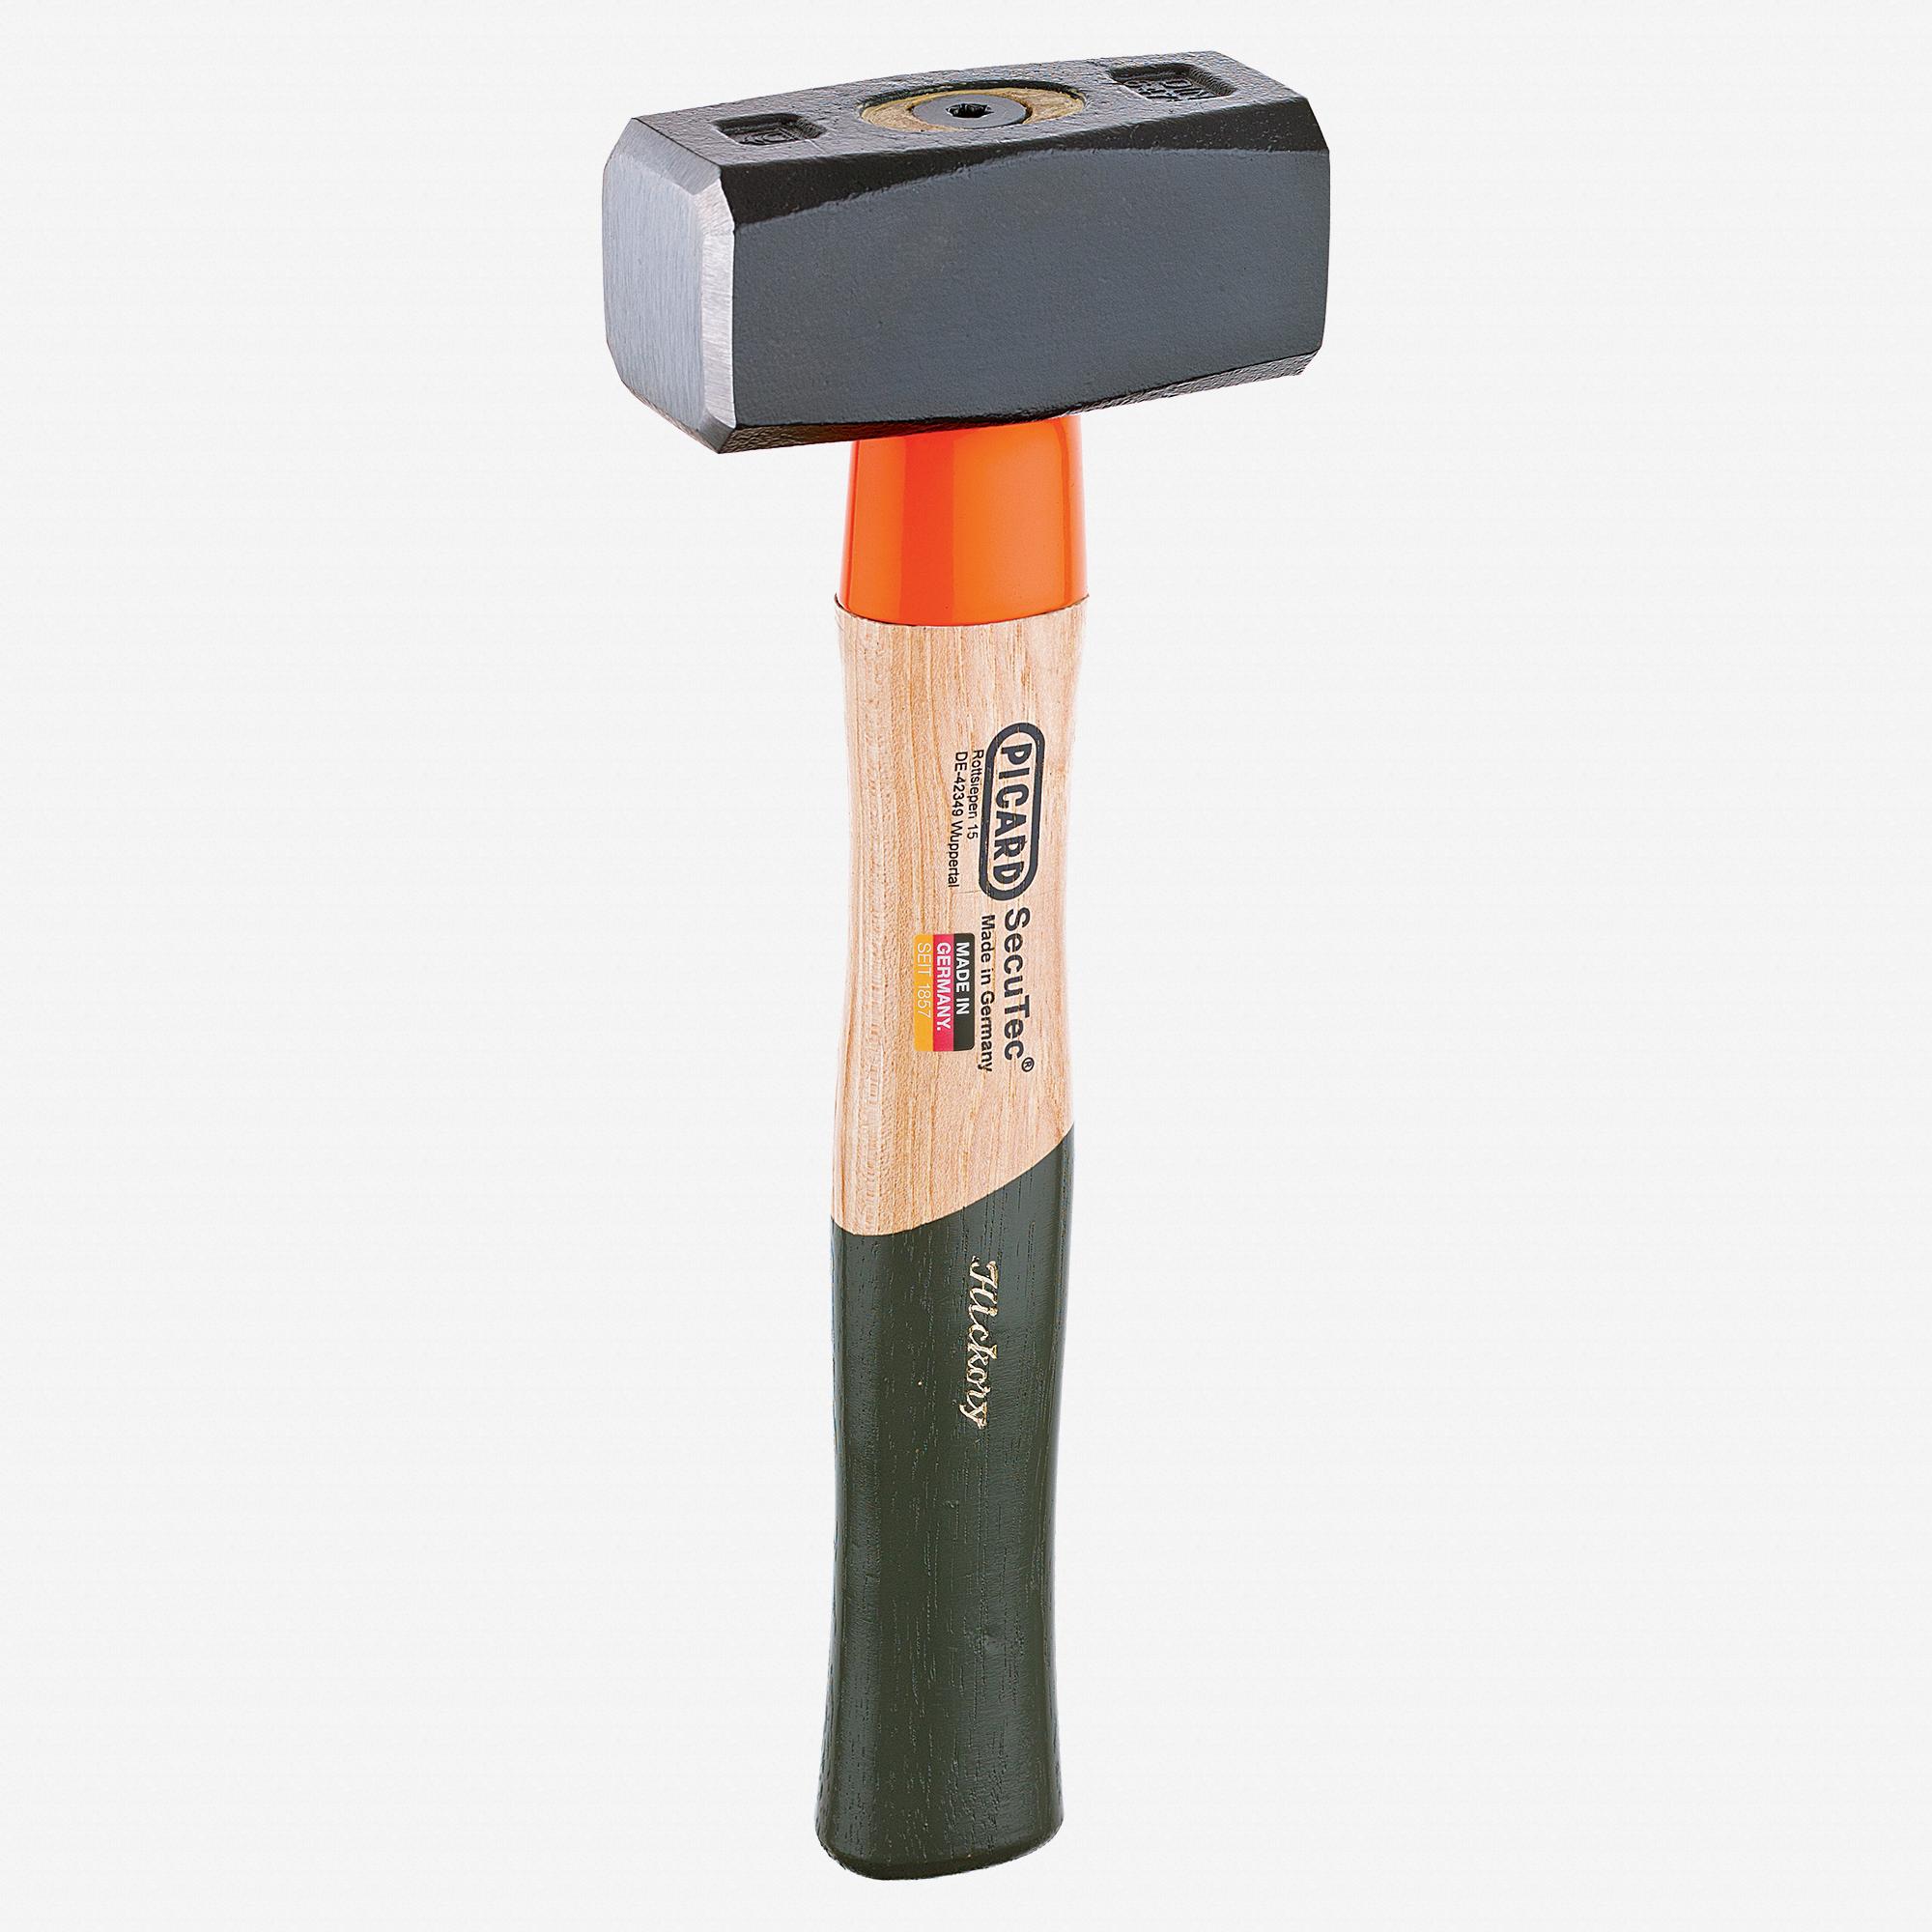 Picard 2.75 lb SecuTec Mining Sledge, hardened handle protection - KC Tool